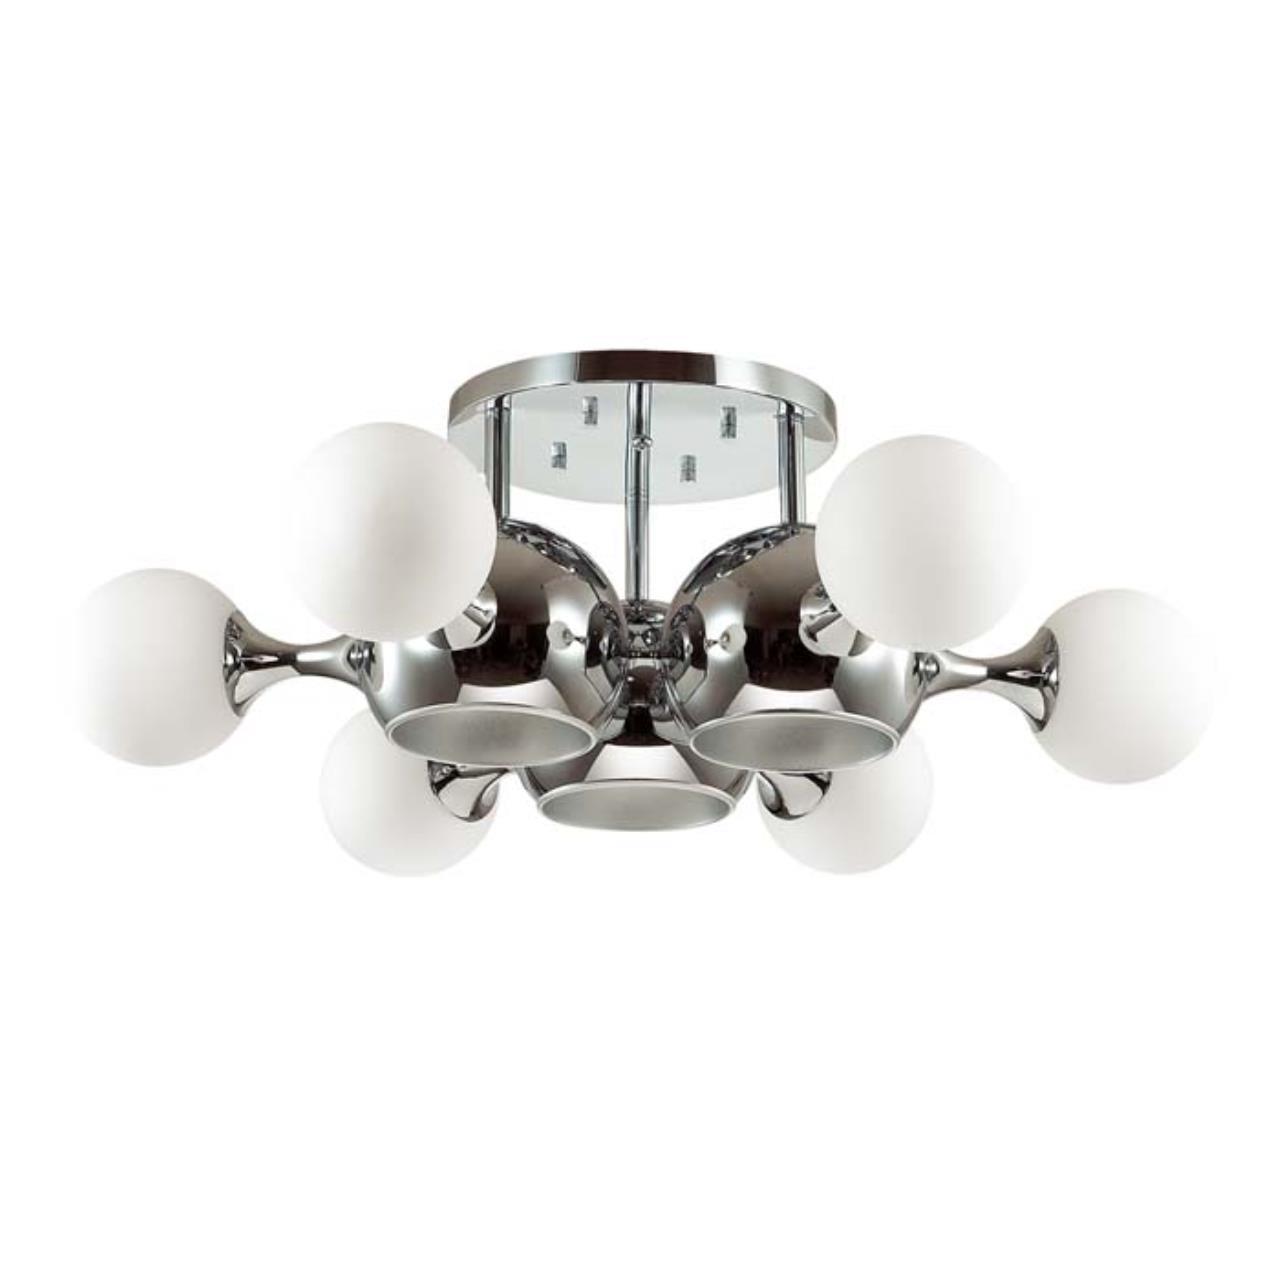 3972/9C MODERN ODL18 327 хром/белый Люстра потолочная IP20 E27, E14 3*60W, 6*40W 220V MIOLLA